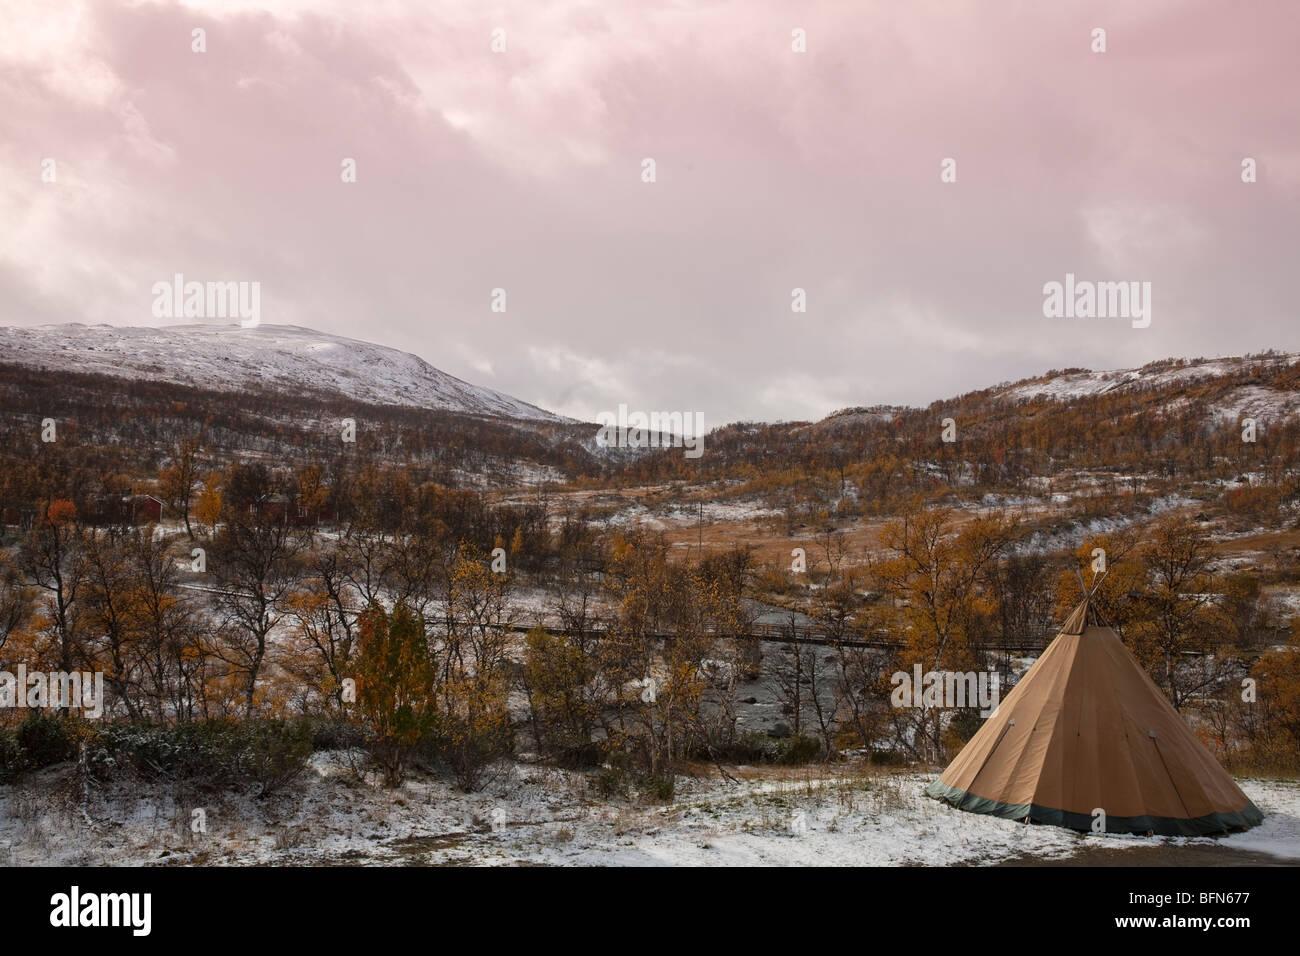 Storulvån fjell  sami hut cot sweden - Stock Image